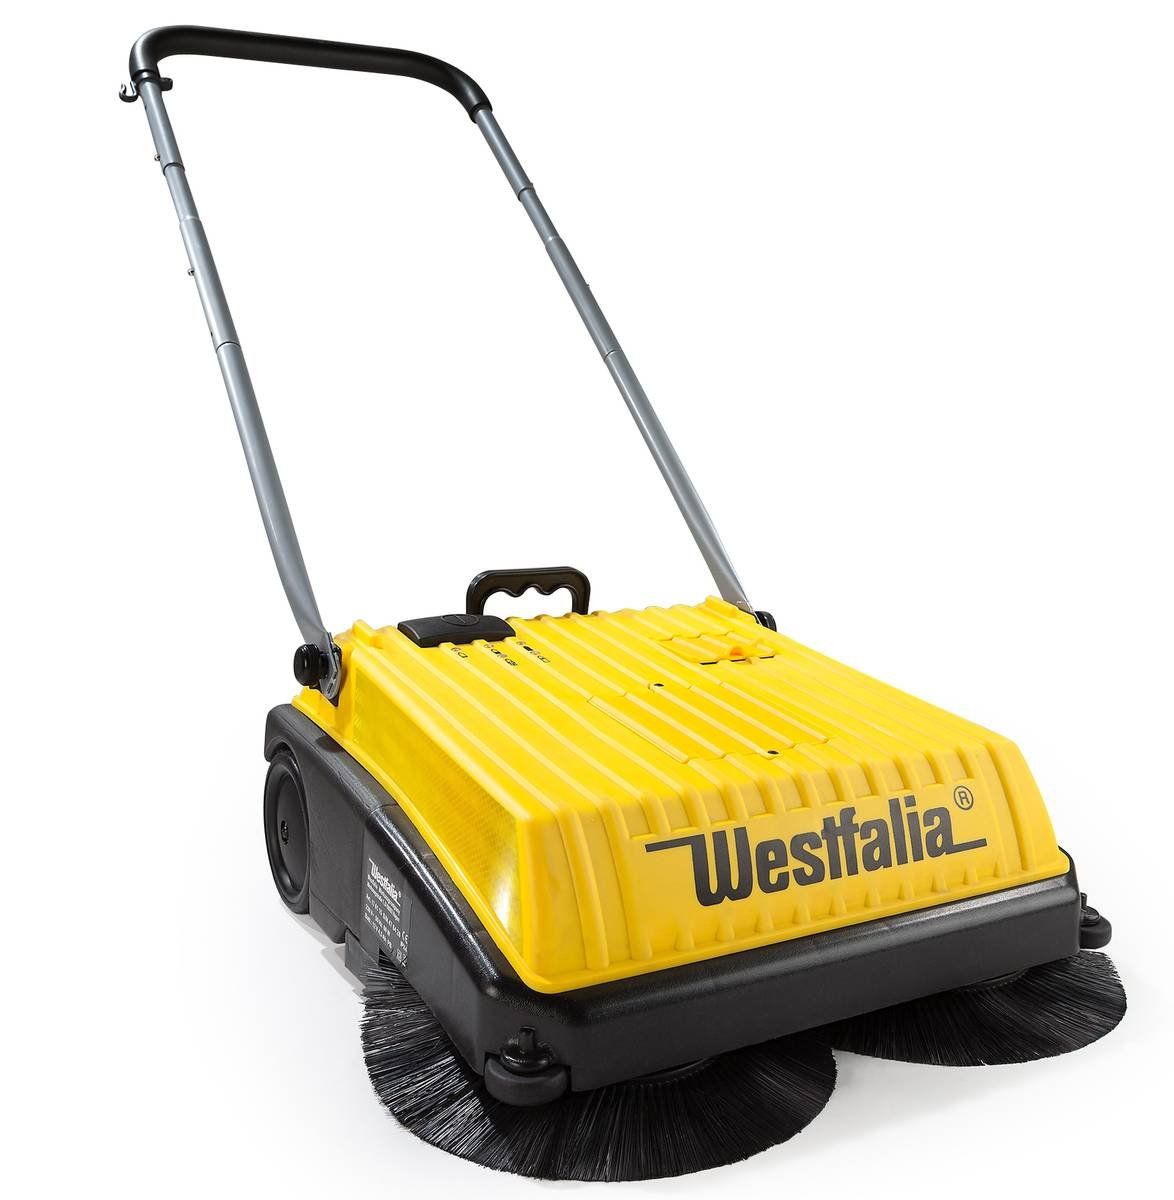 Westfalia Akku Kehrmaschine Hofkehrmaschine 230/12 V - elektrische